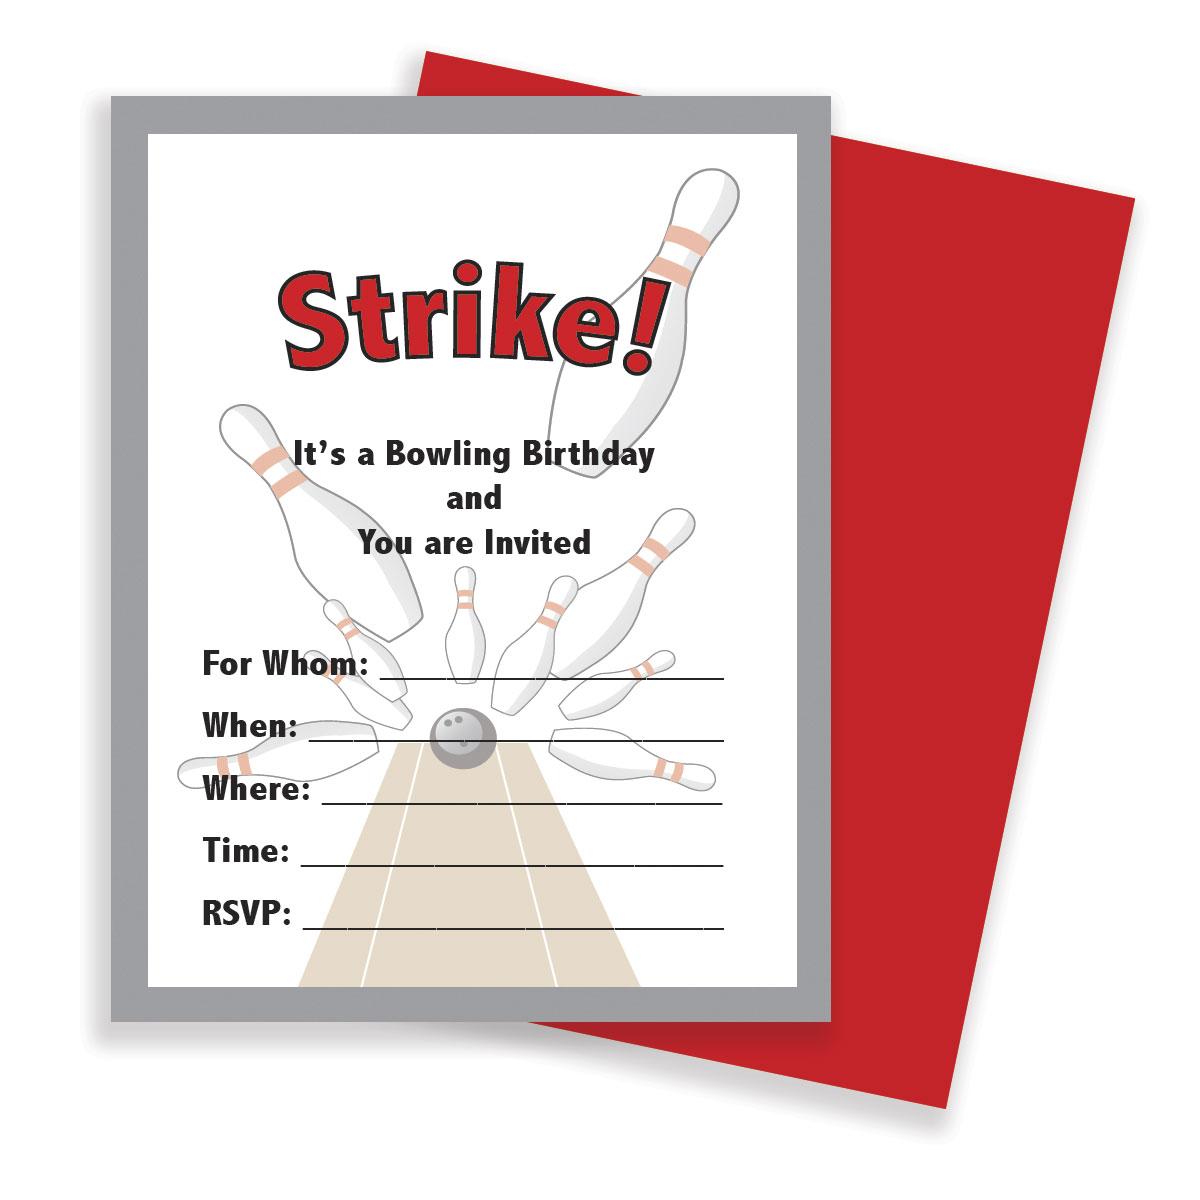 Birthday Party Invitations – Bowling – SMH Illustration & Design